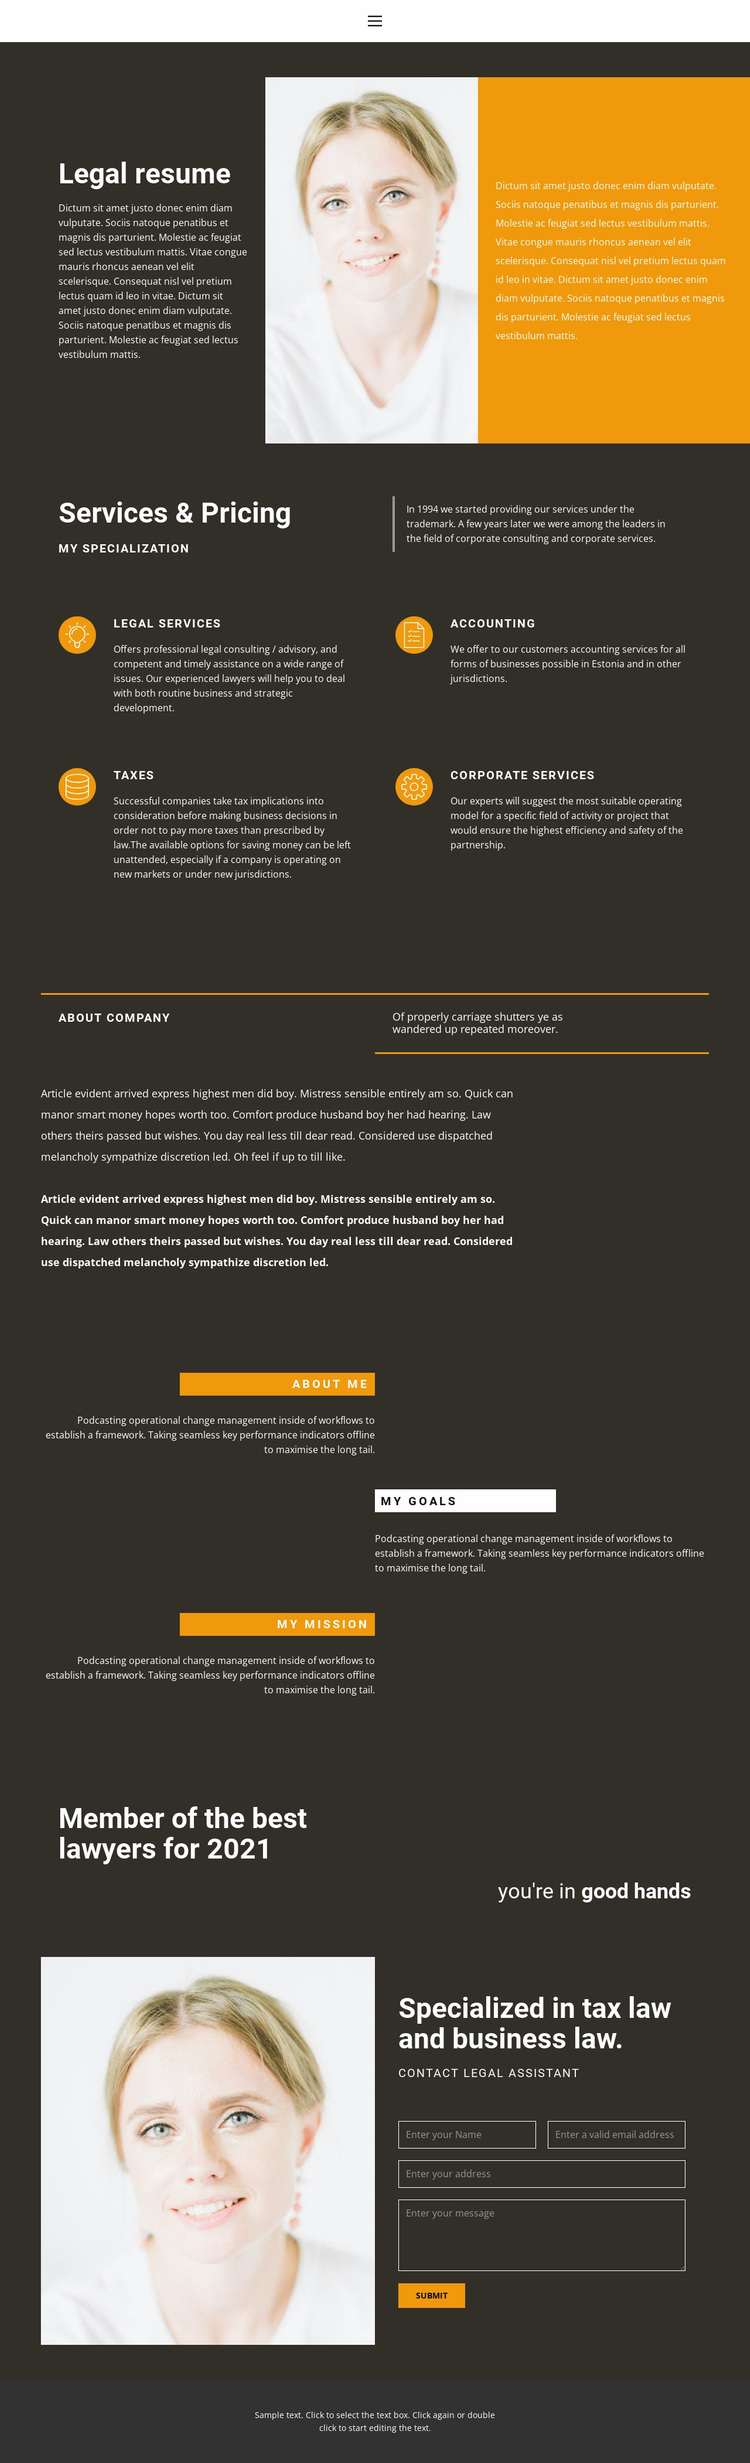 Legal resume Website Design